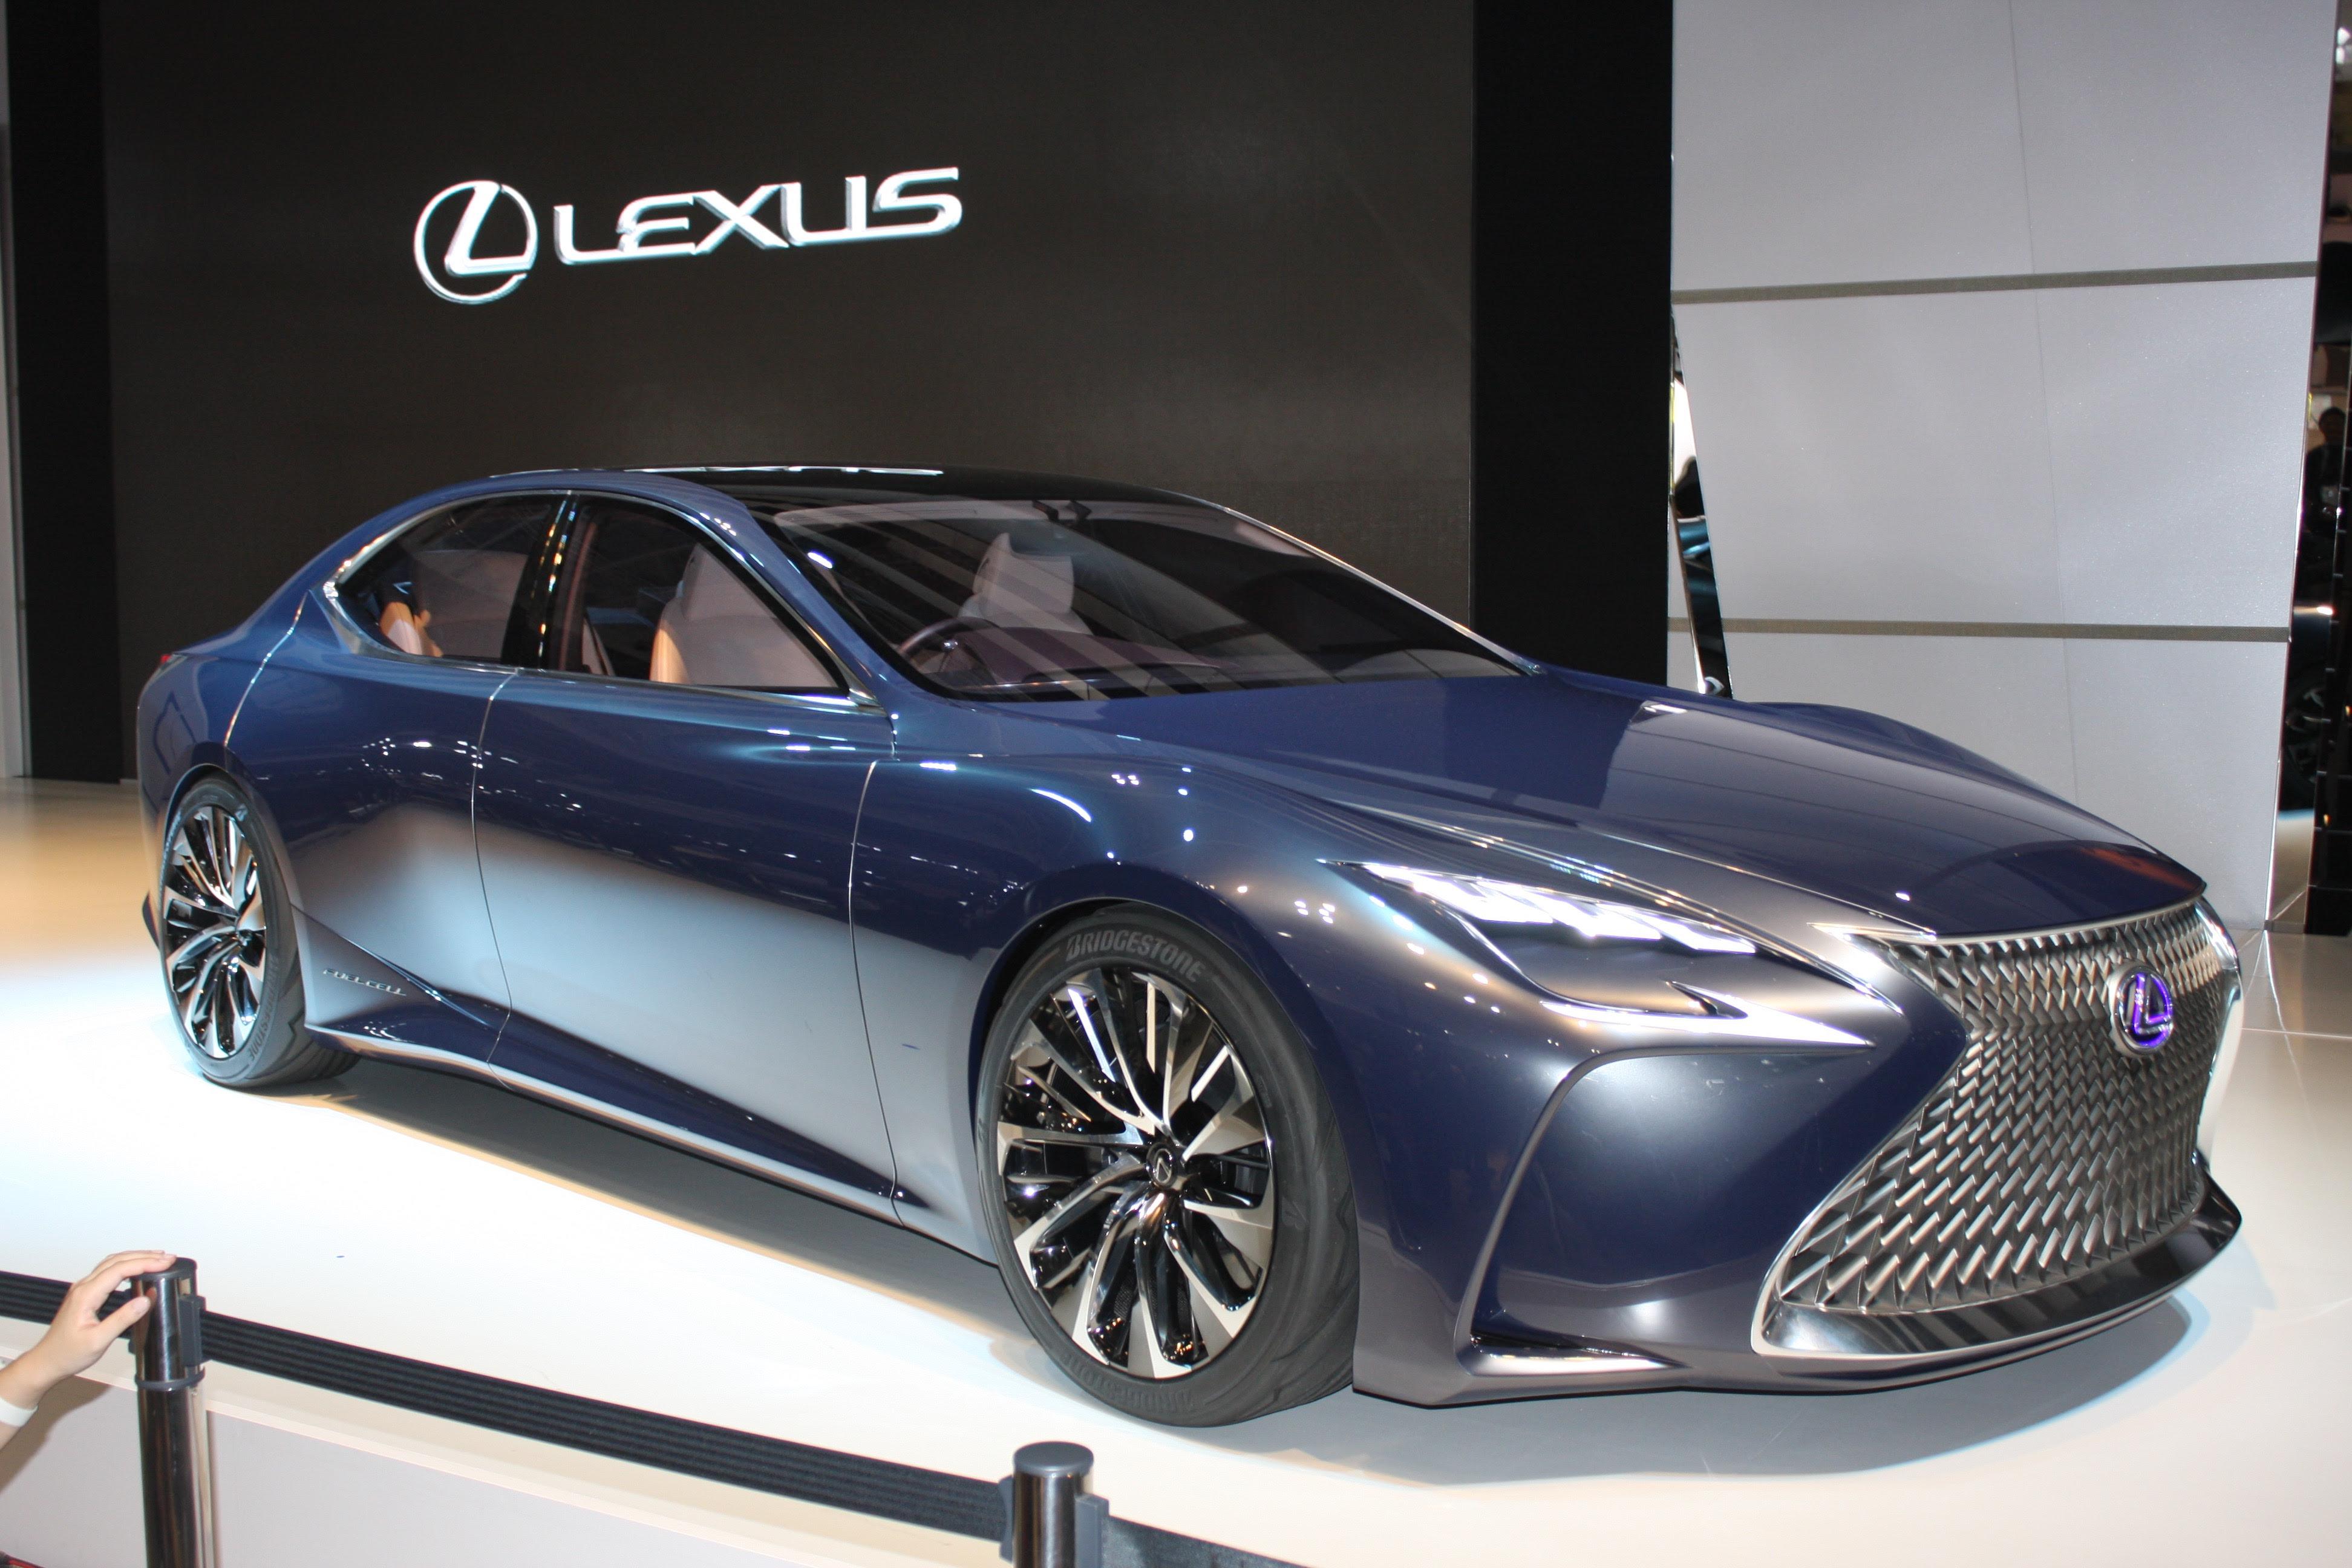 2019 Lexus Ls Review - New Cars Review